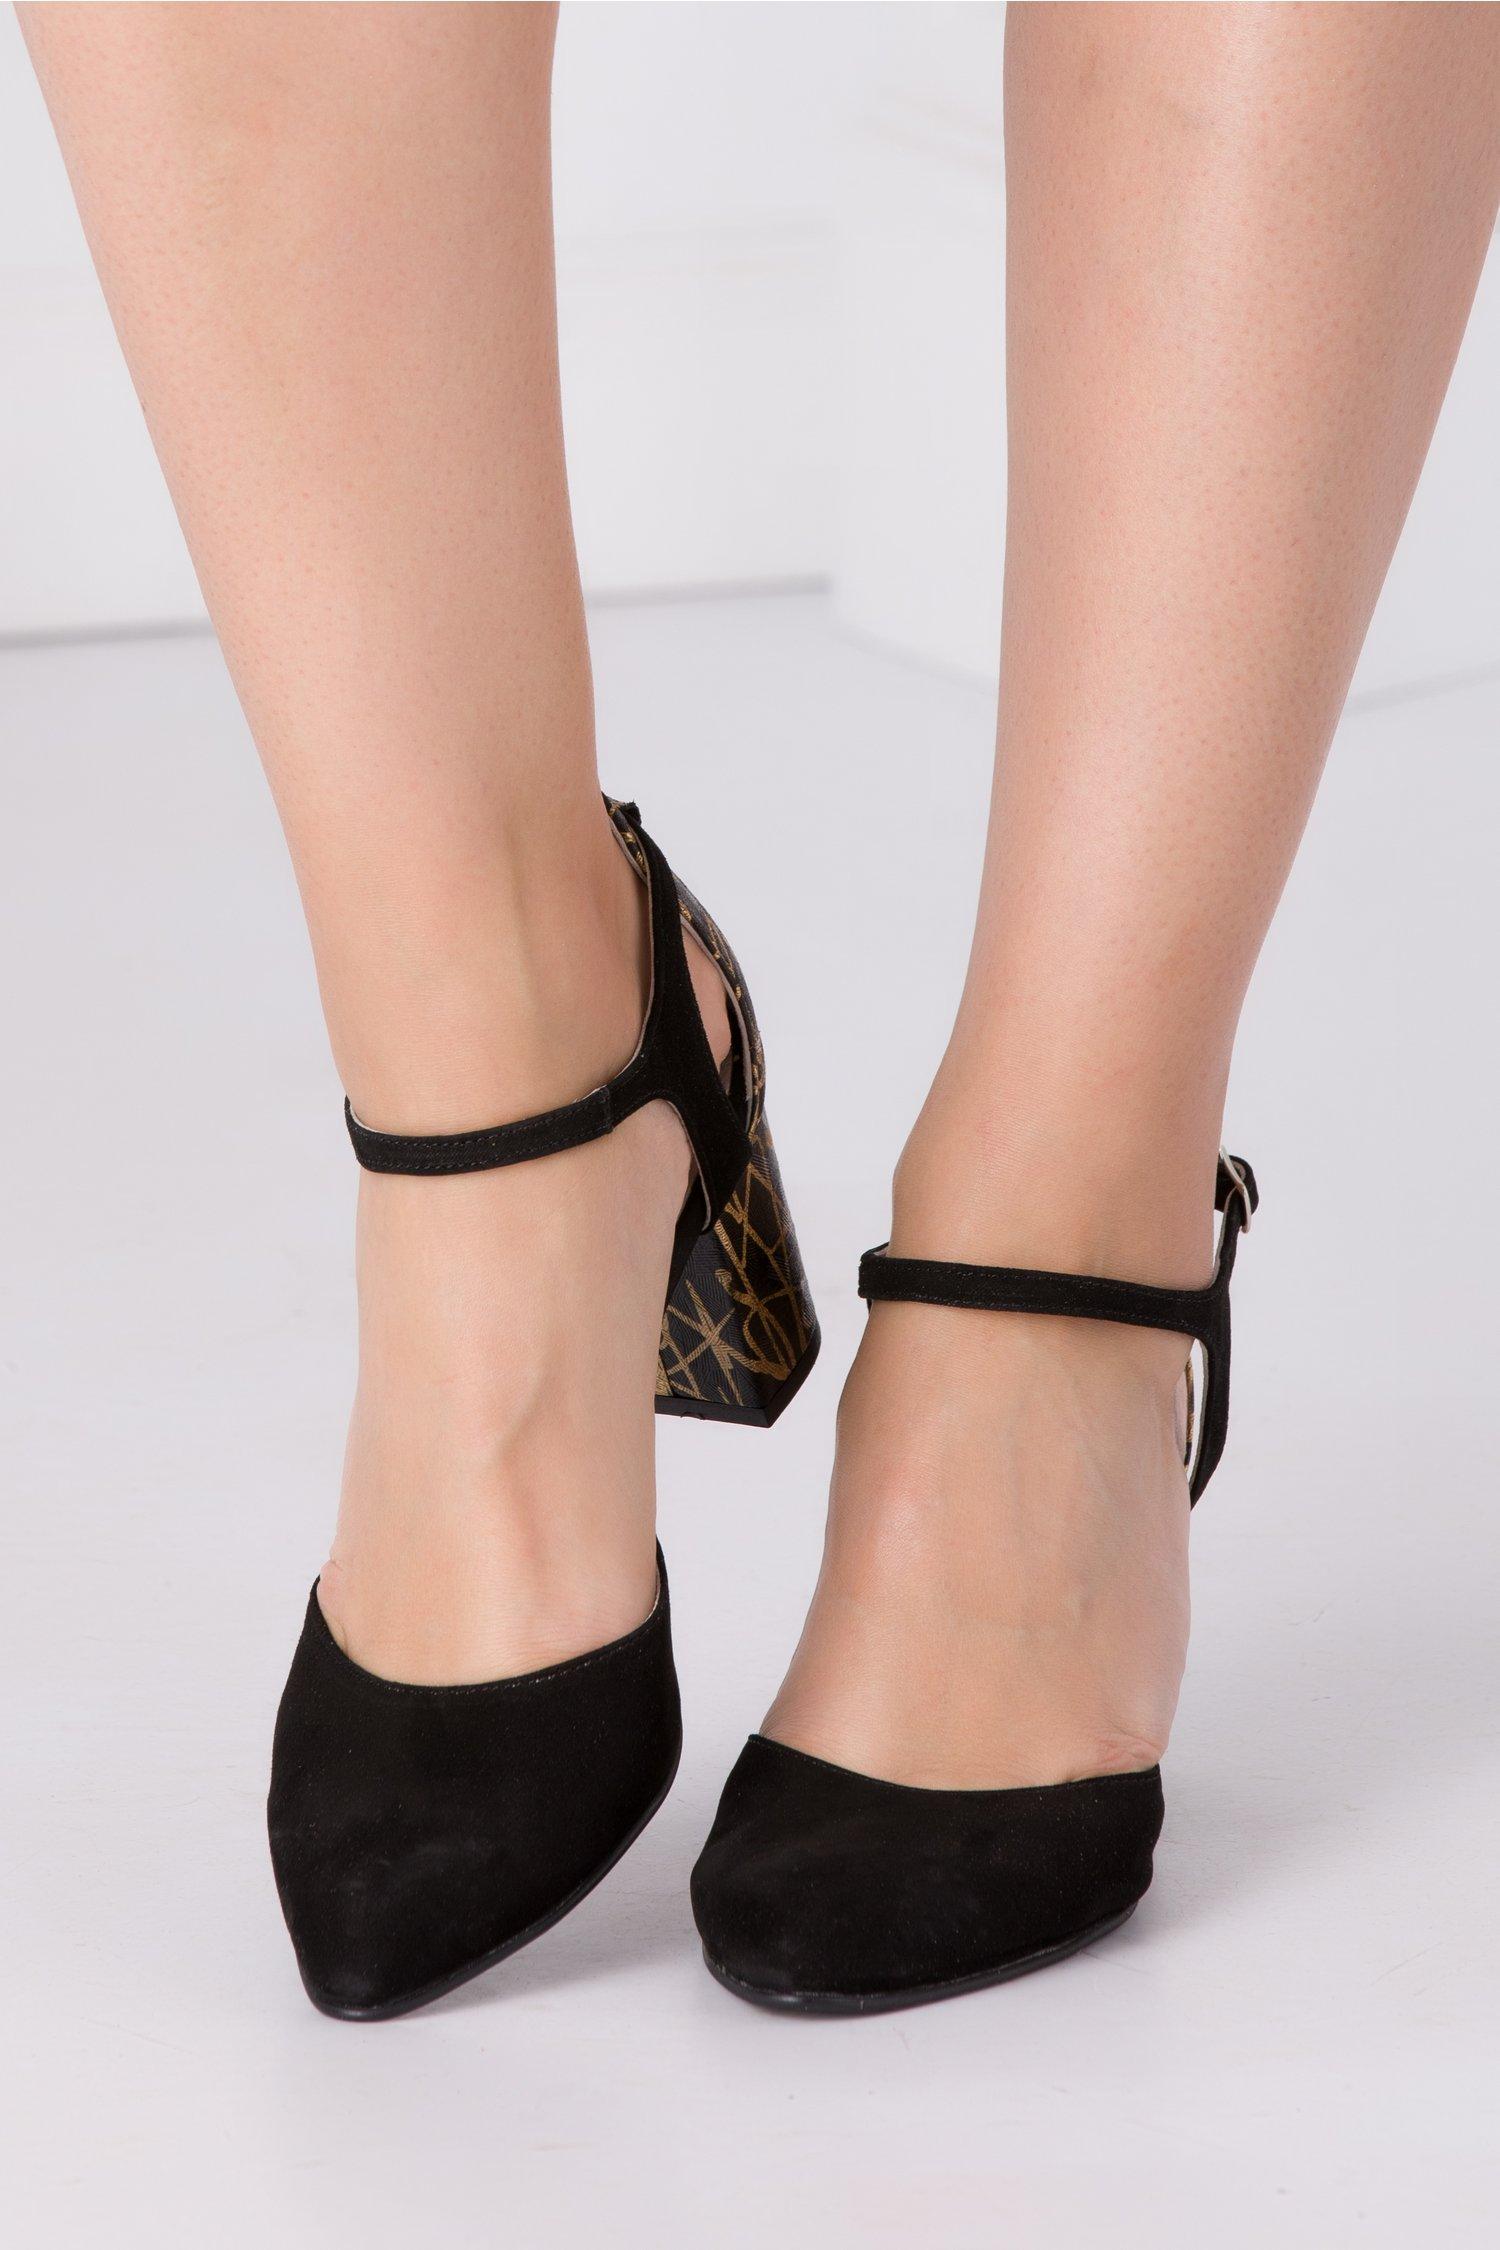 Pantofi negri din piele intoarsa cu motive aurii la spate